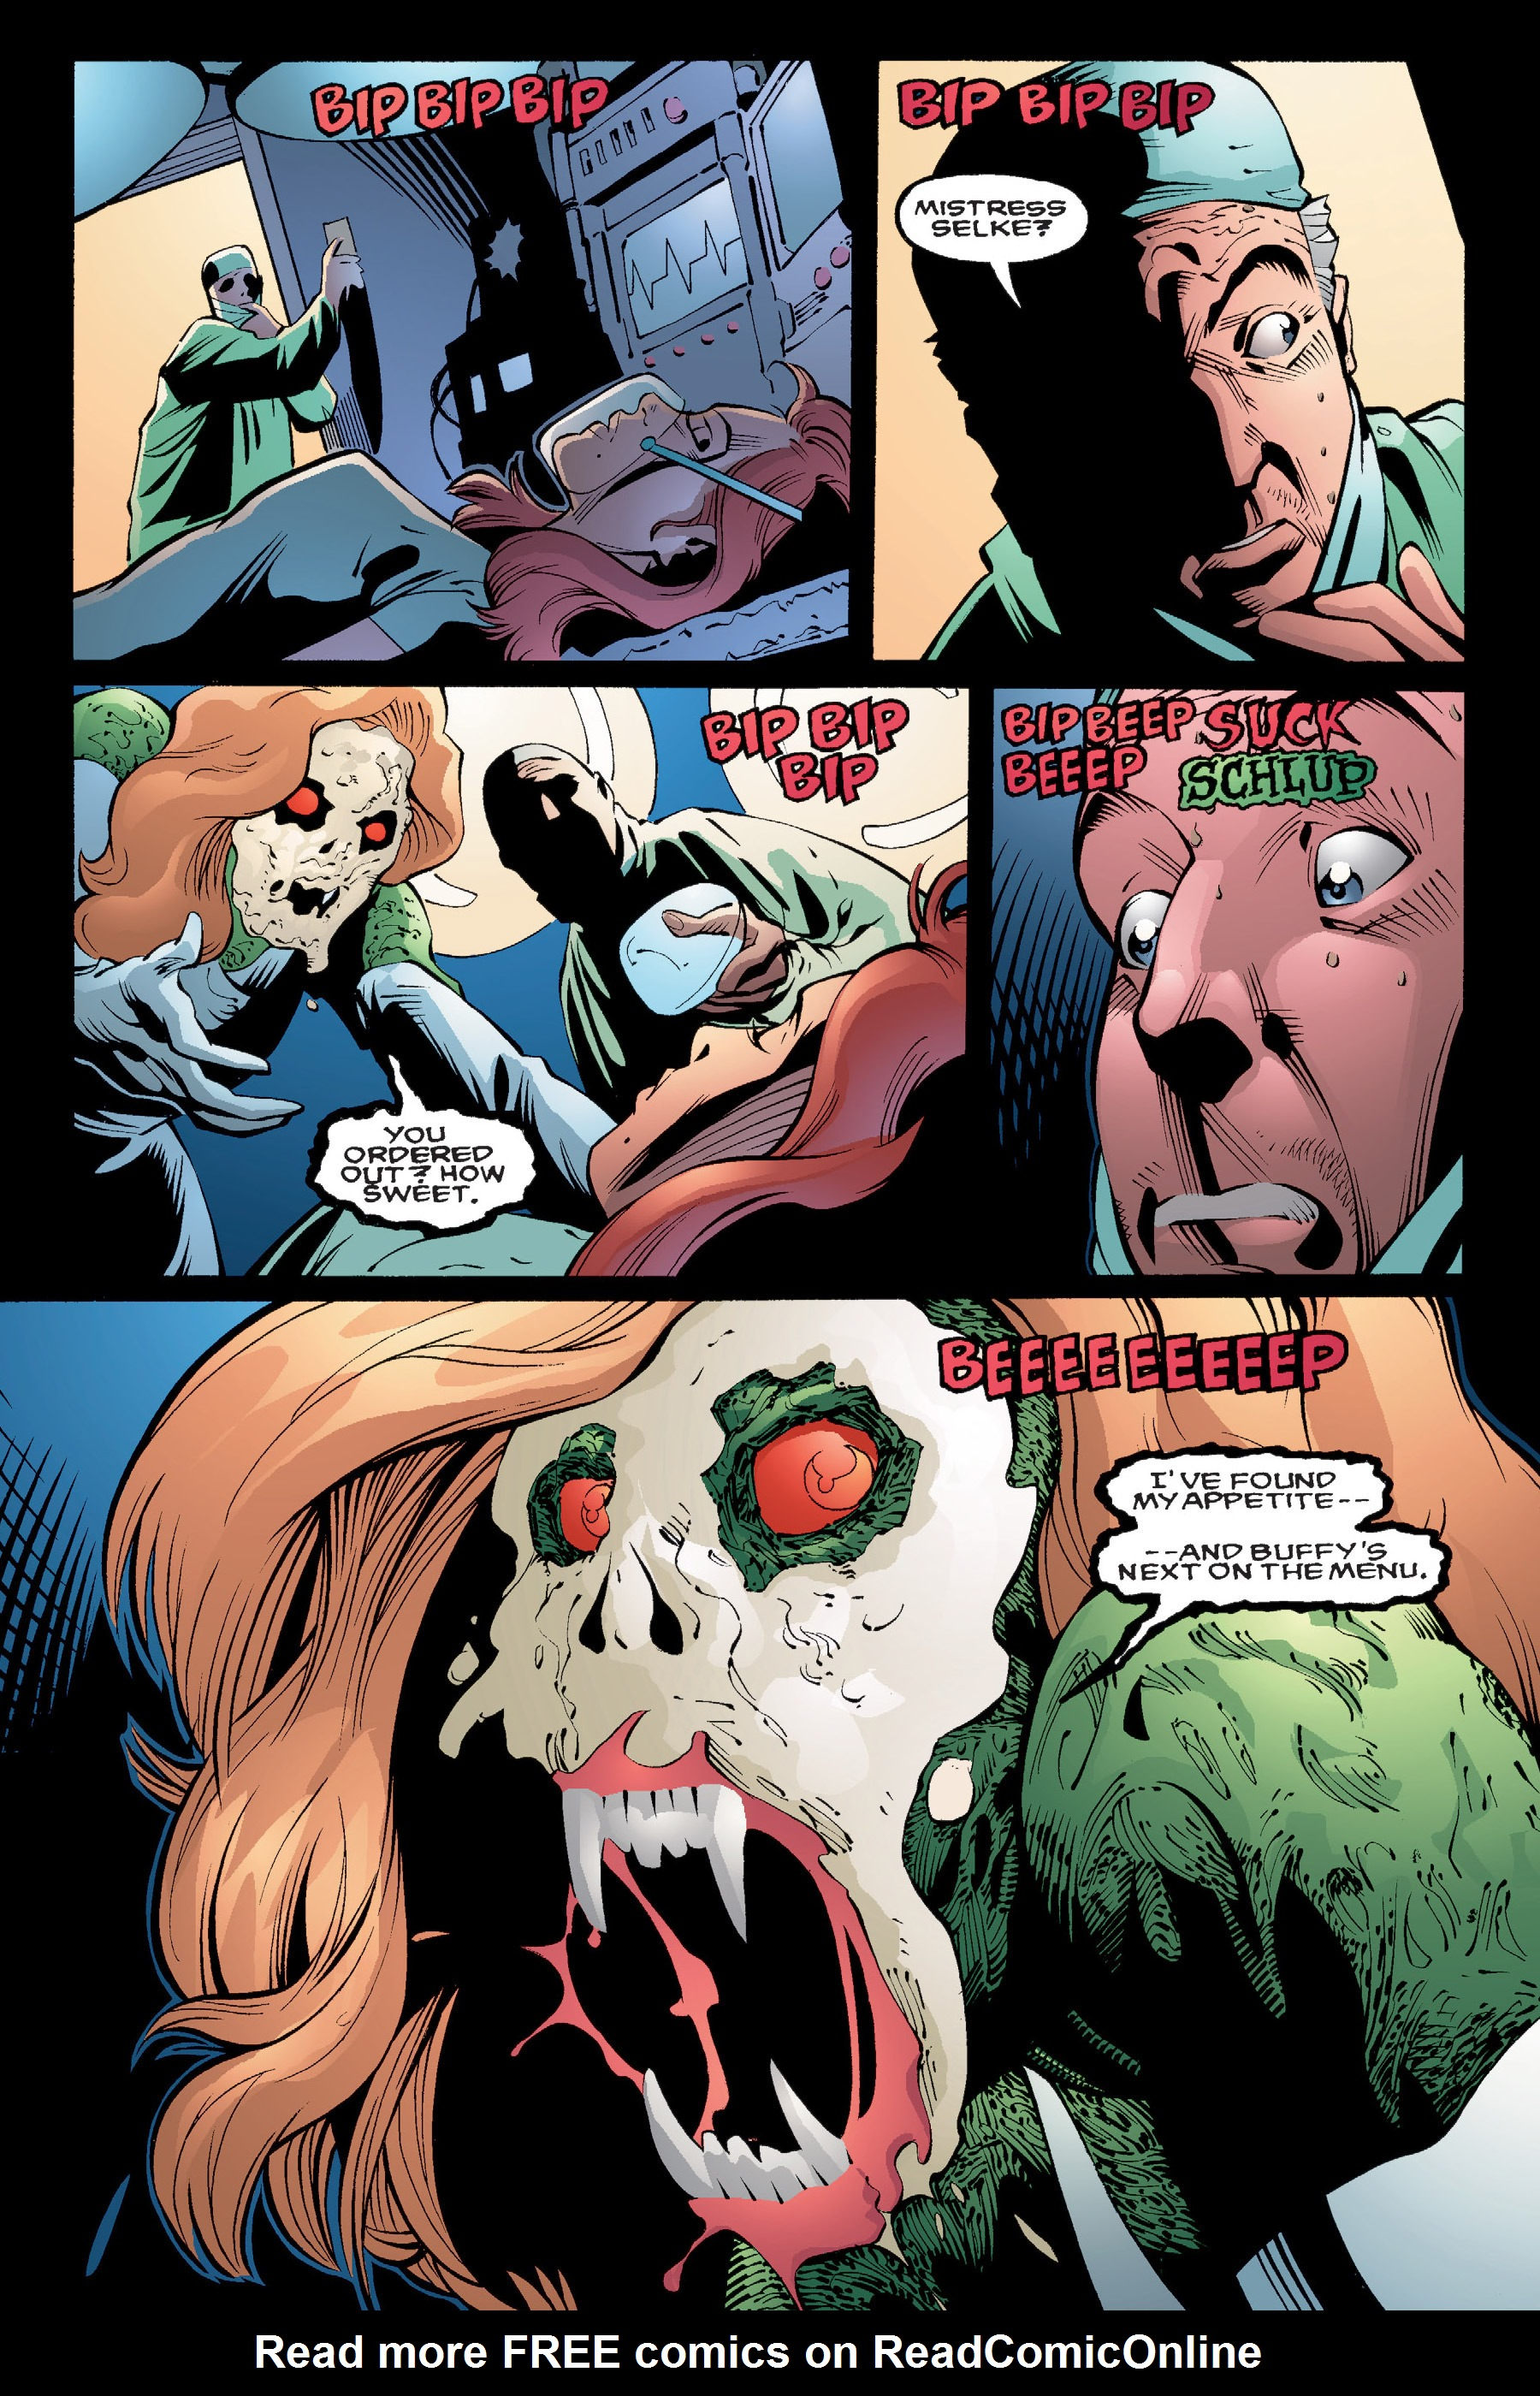 Read online Buffy the Vampire Slayer: Omnibus comic -  Issue # TPB 4 - 31